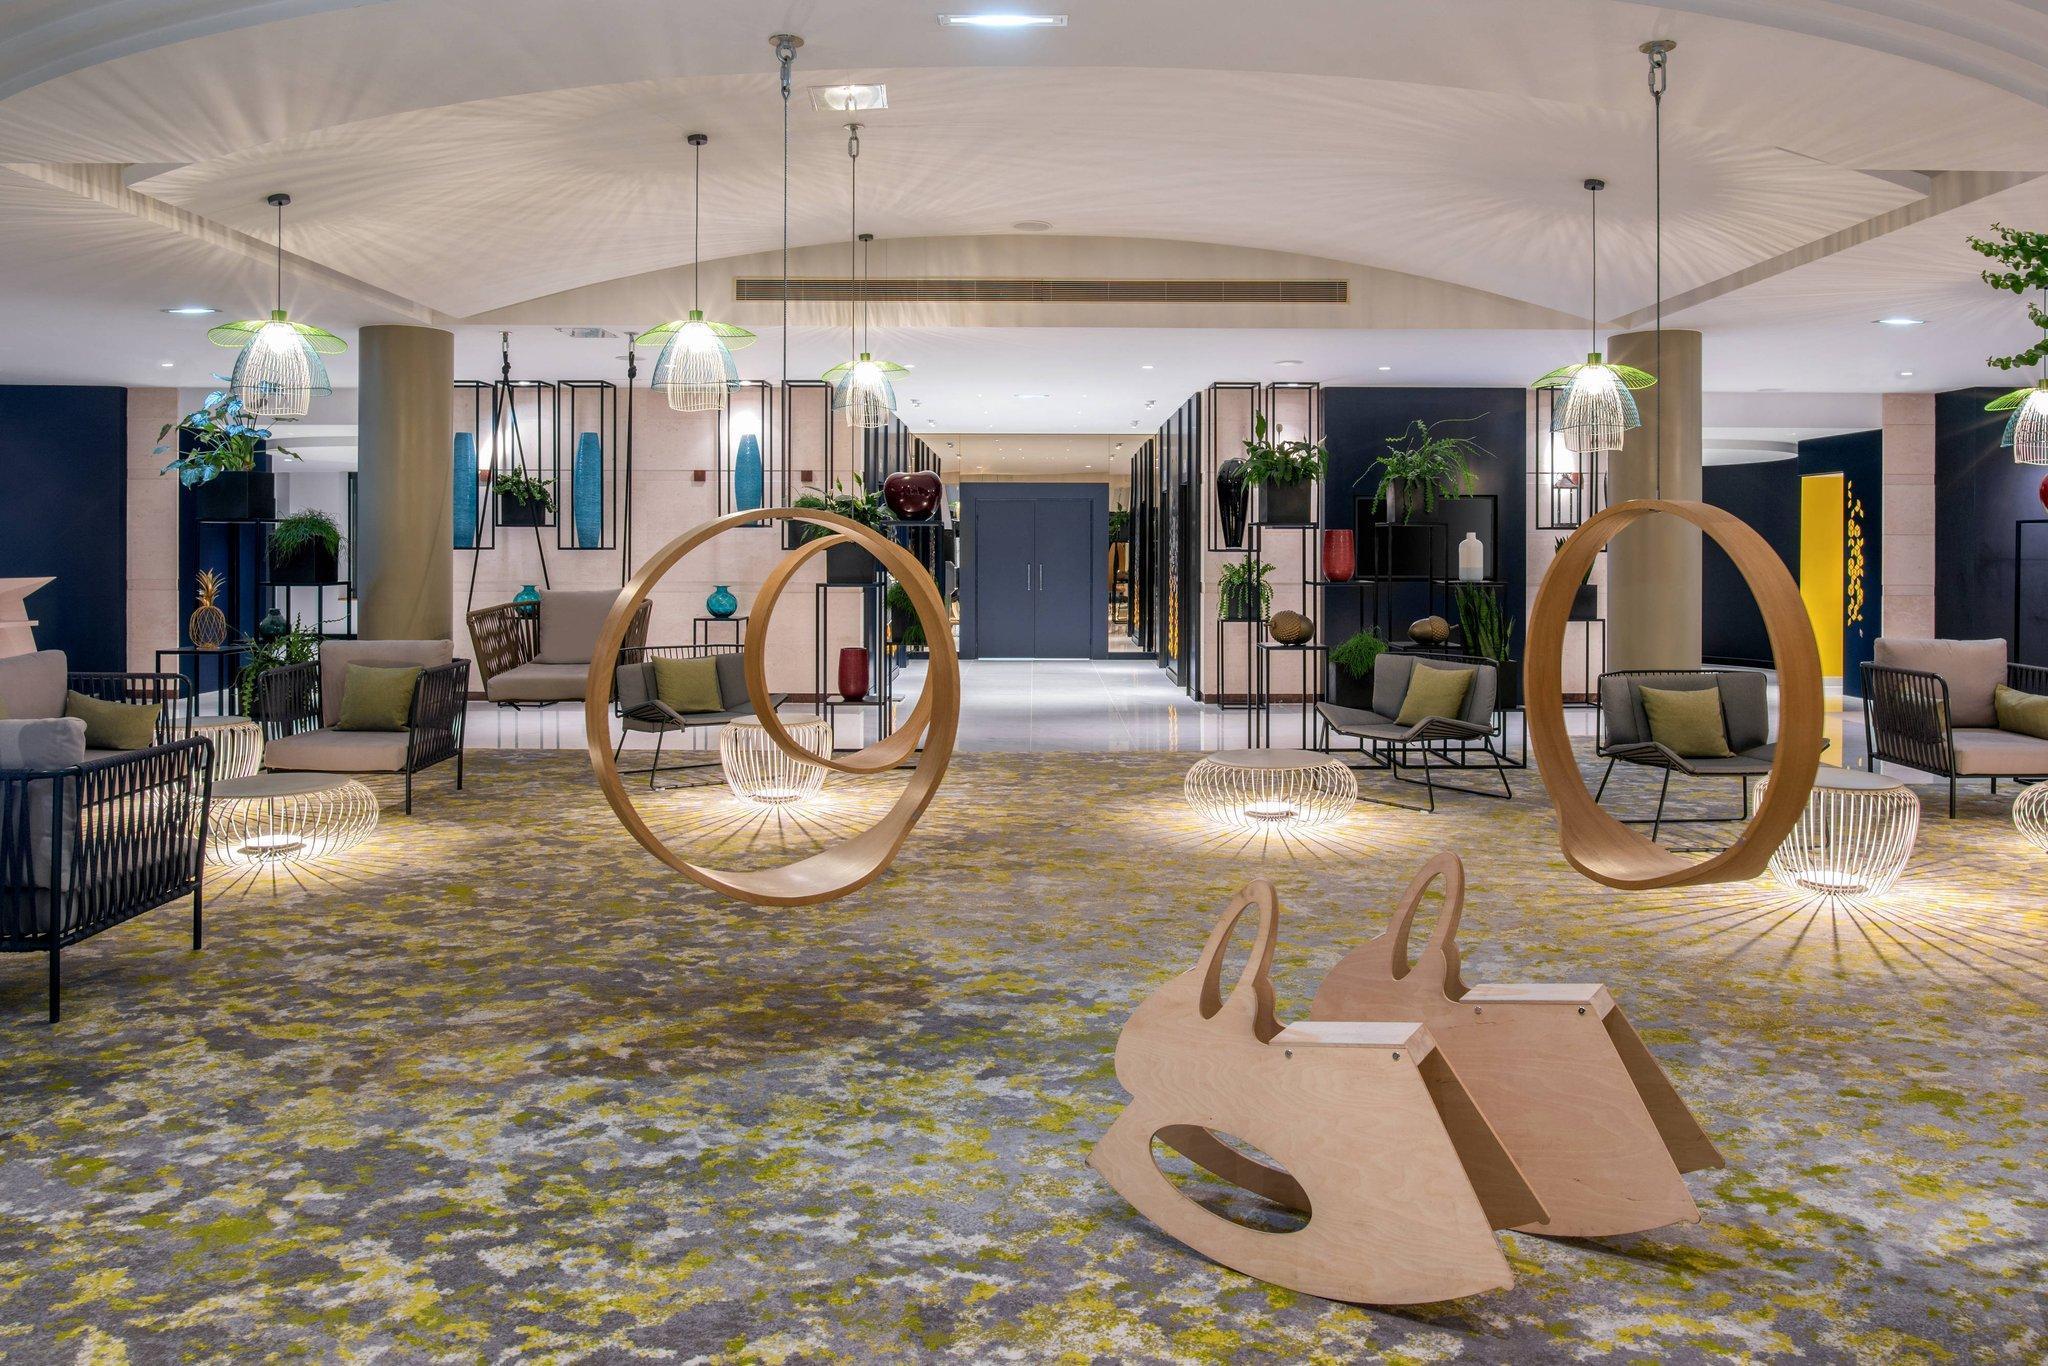 Courtyard Paris Roissy Charles de Gaulle Airport Hotel